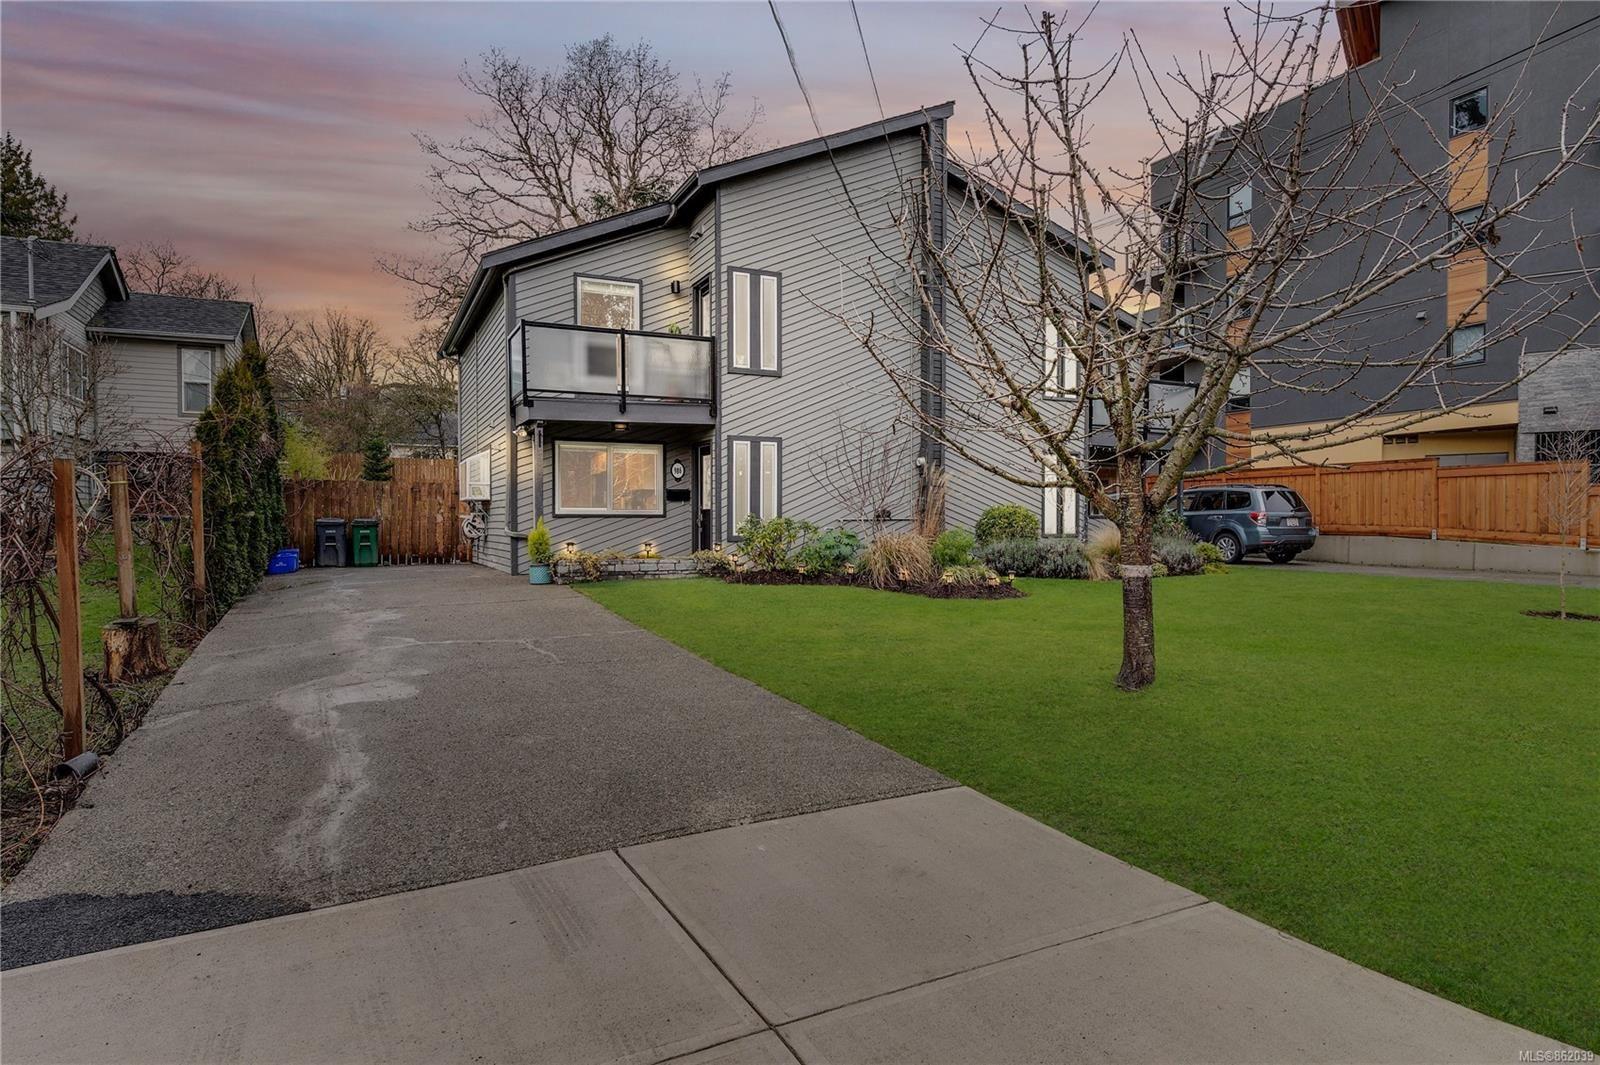 Main Photo: 986 Annie St in : SE Quadra Half Duplex for sale (Saanich East)  : MLS®# 862039